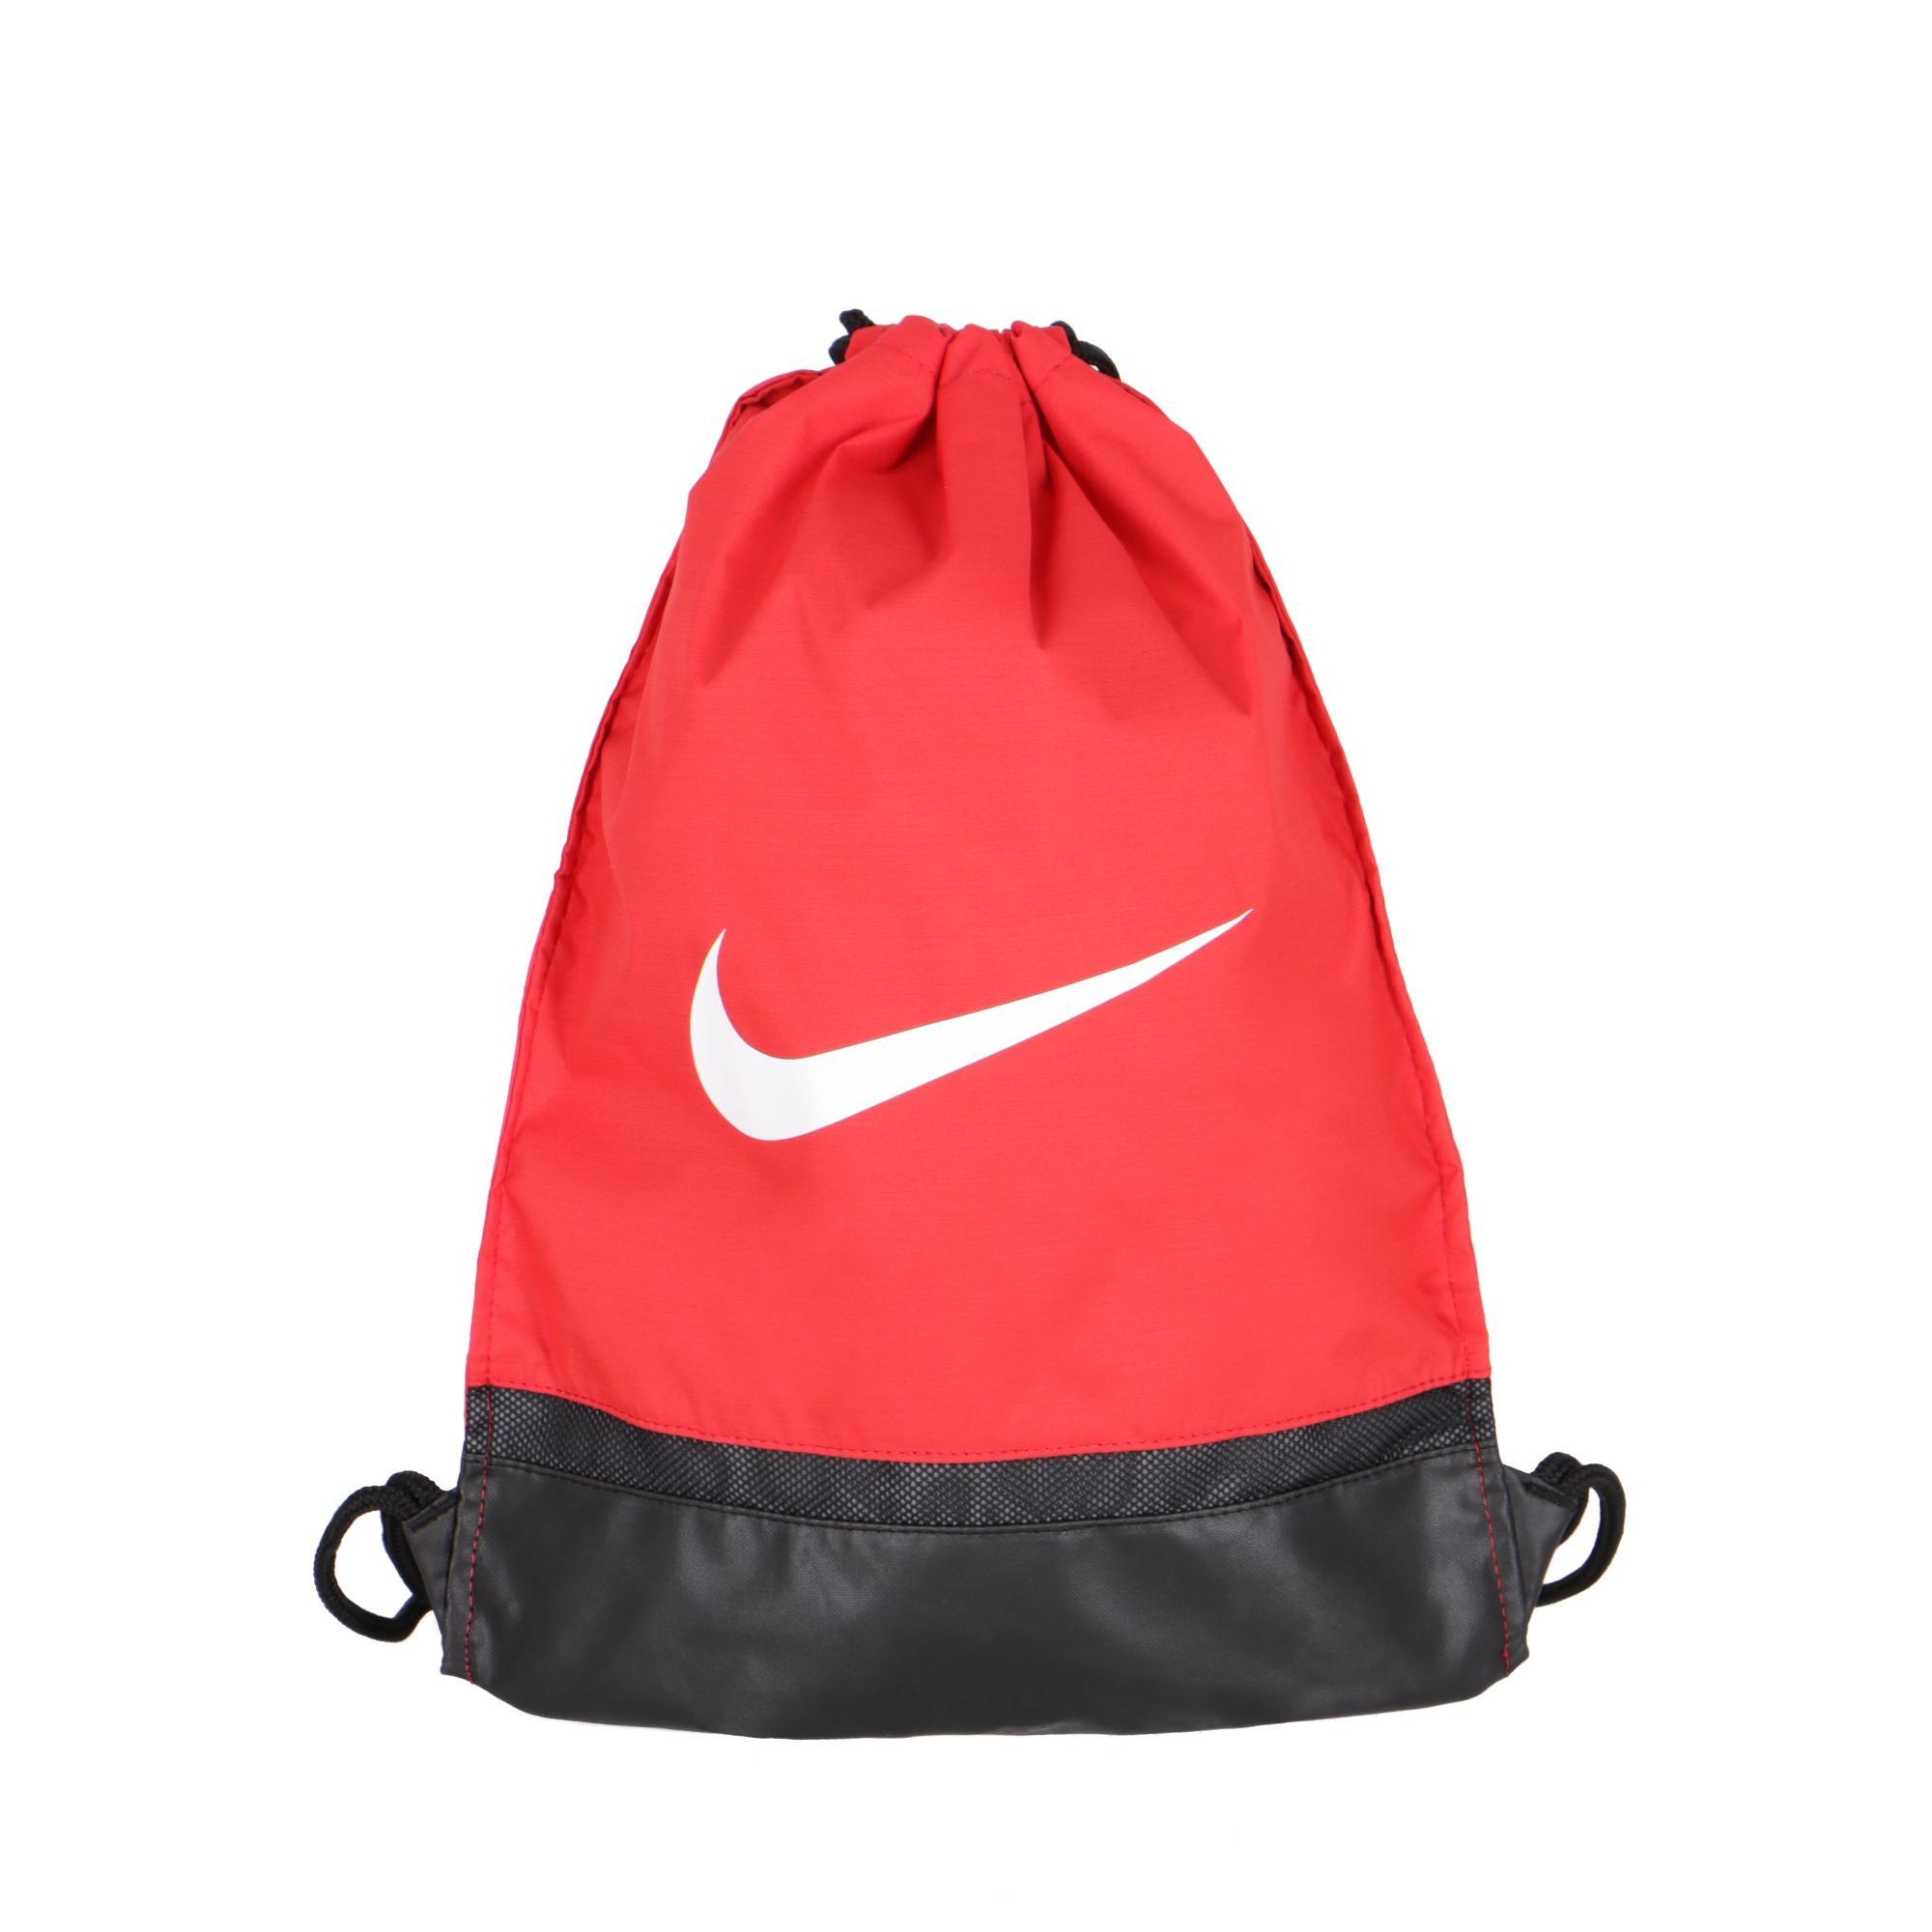 e967c0ccf632 Nike Brasilia Gym Sack University Red white